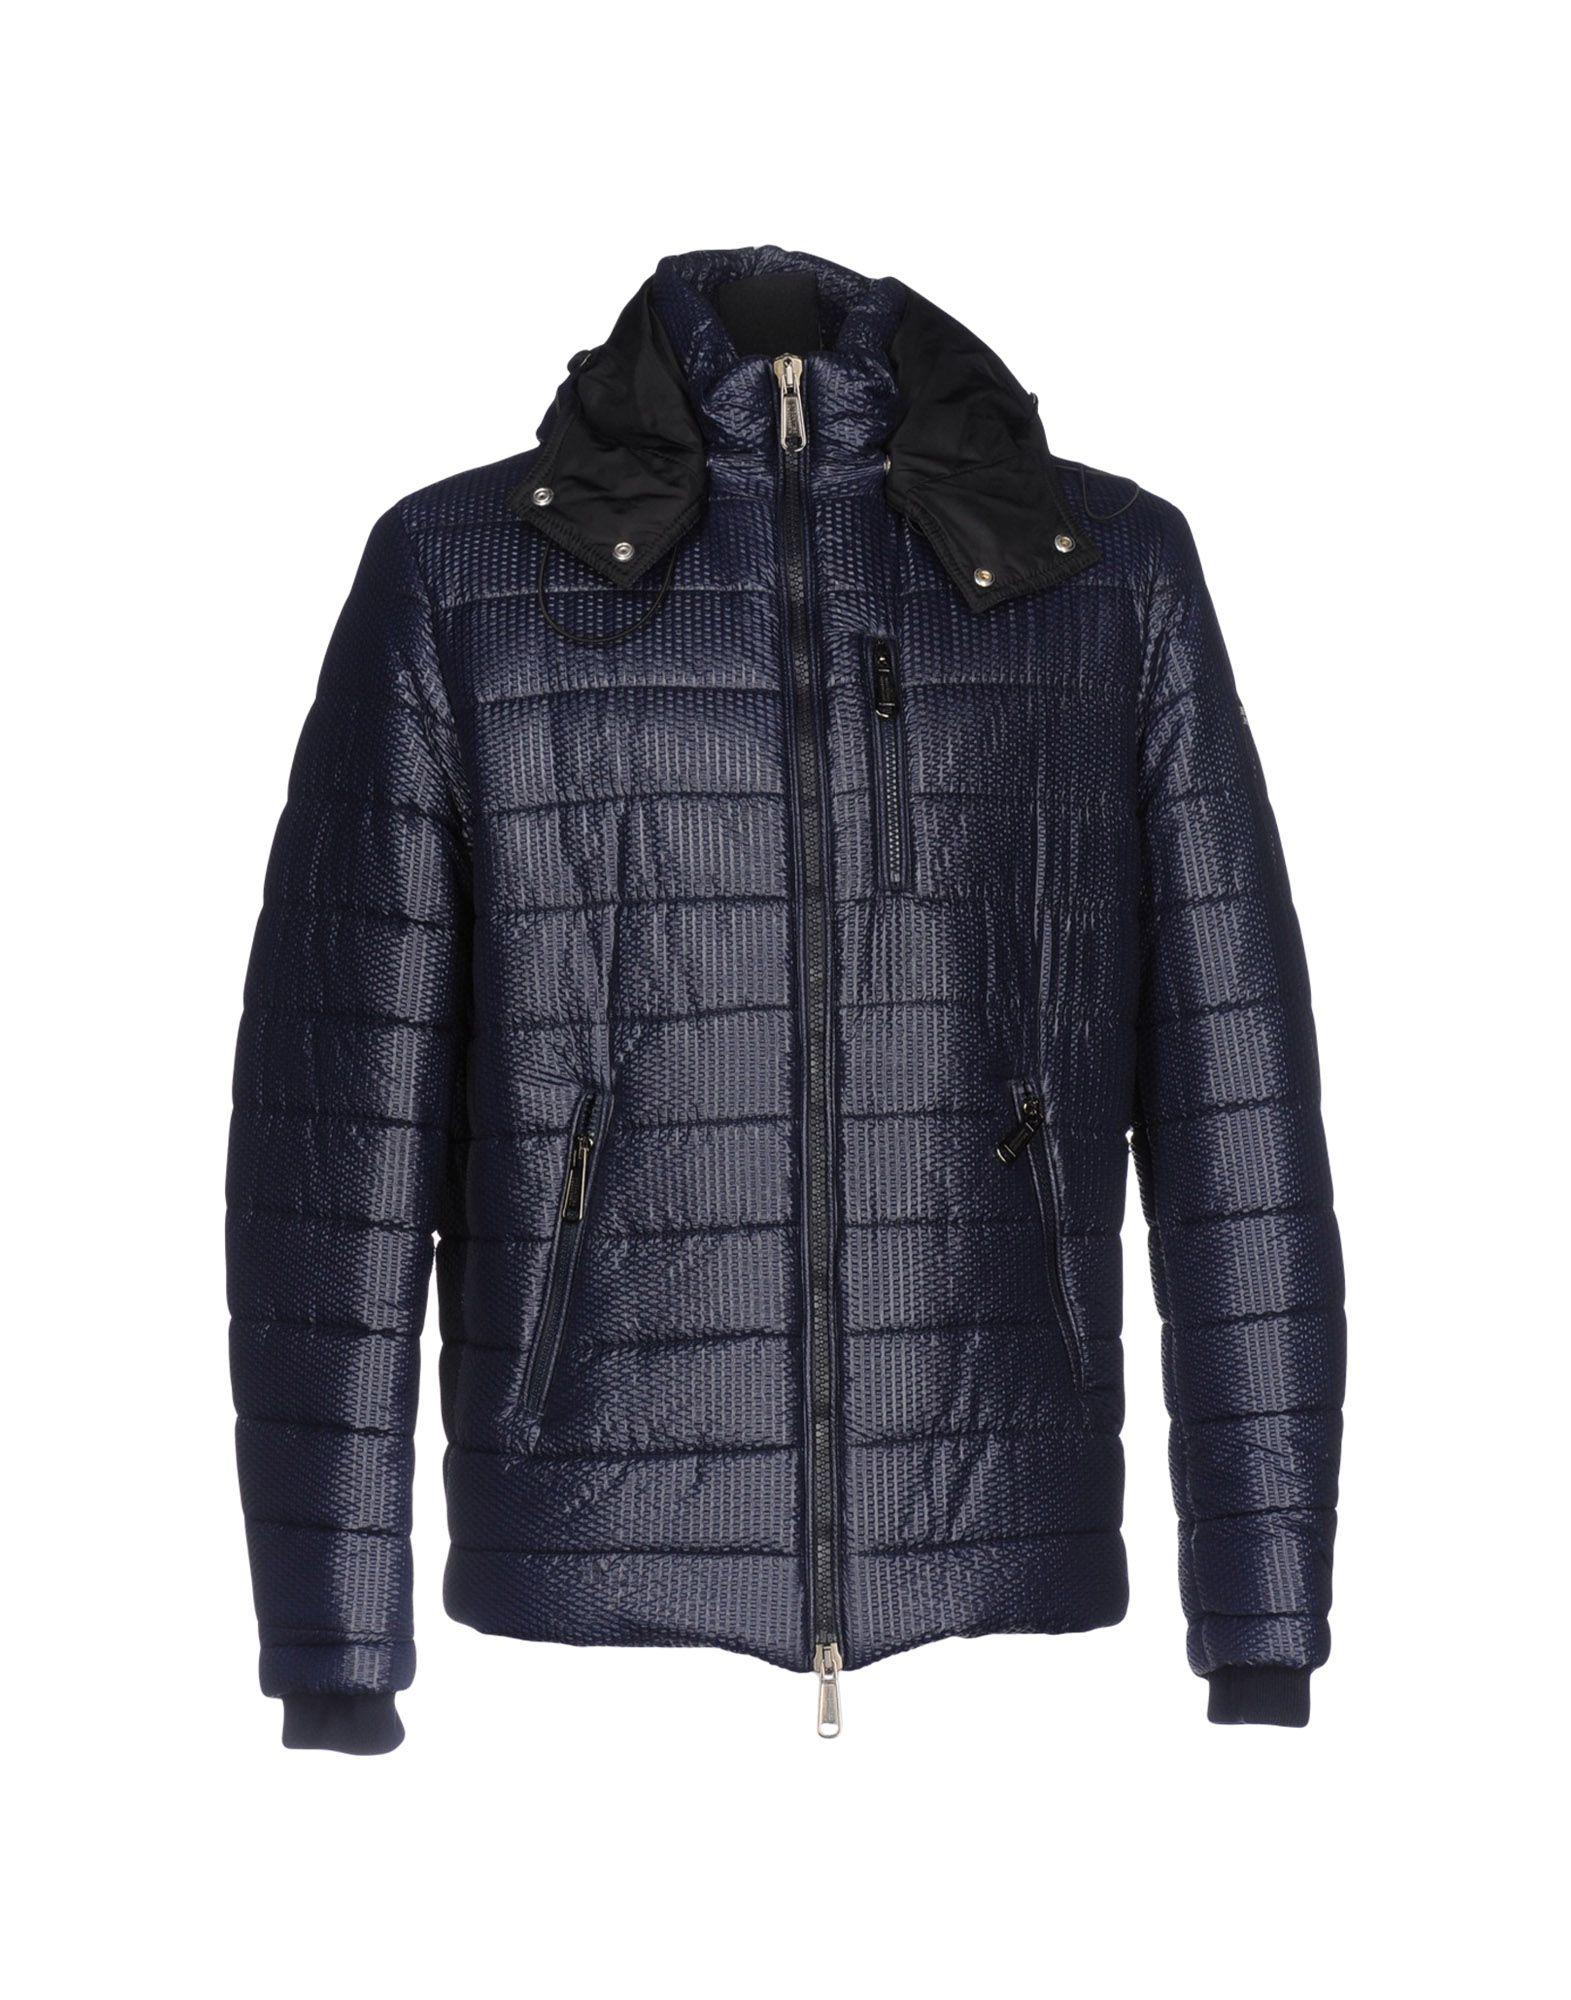 ALESSANDRO DELL´ACQUA Herren Jacke Farbe Dunkelblau Größe 2